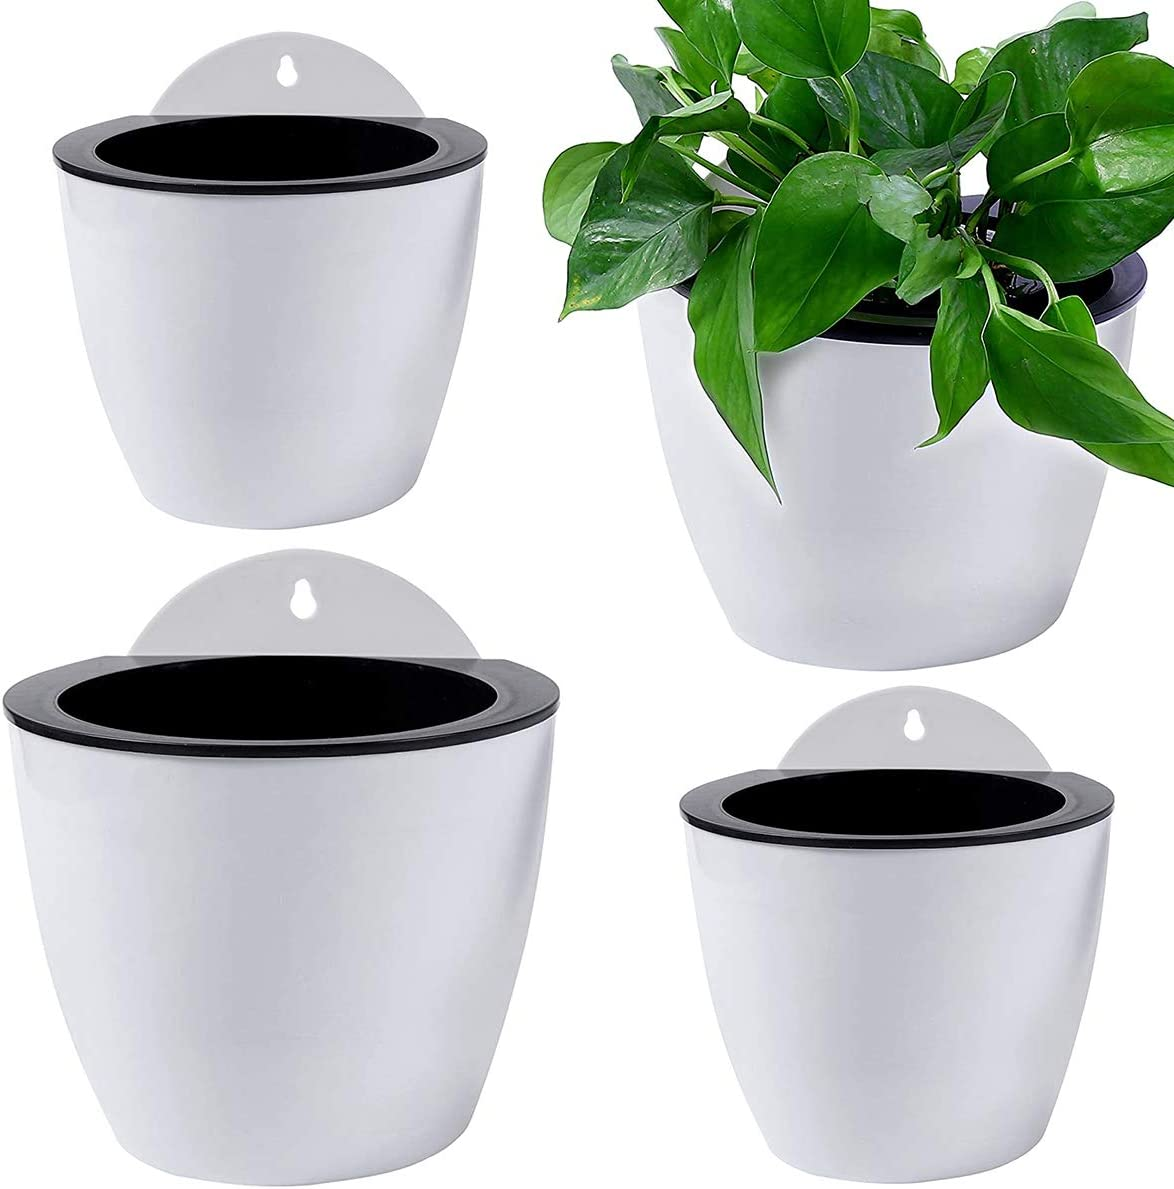 Qixuer 4 Piezas Automática Absorción de Agua para Pared Macetas,Macetas de Plástico para Colgar para Hogar Oficina Flor Balcón Cerca Adornos de Jardín (2 Tamaños)